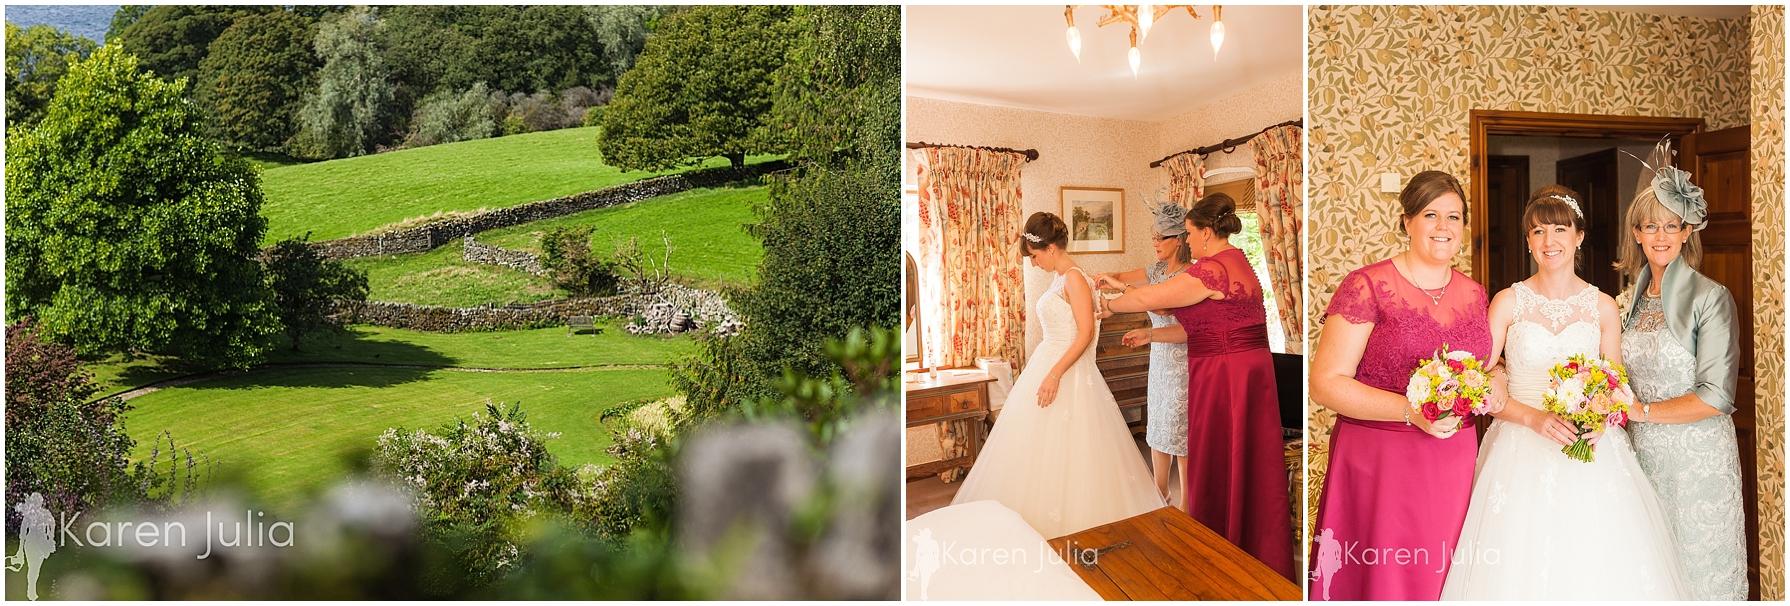 Miller-Howe-Hotel-Summer-Wedding-Photography-03